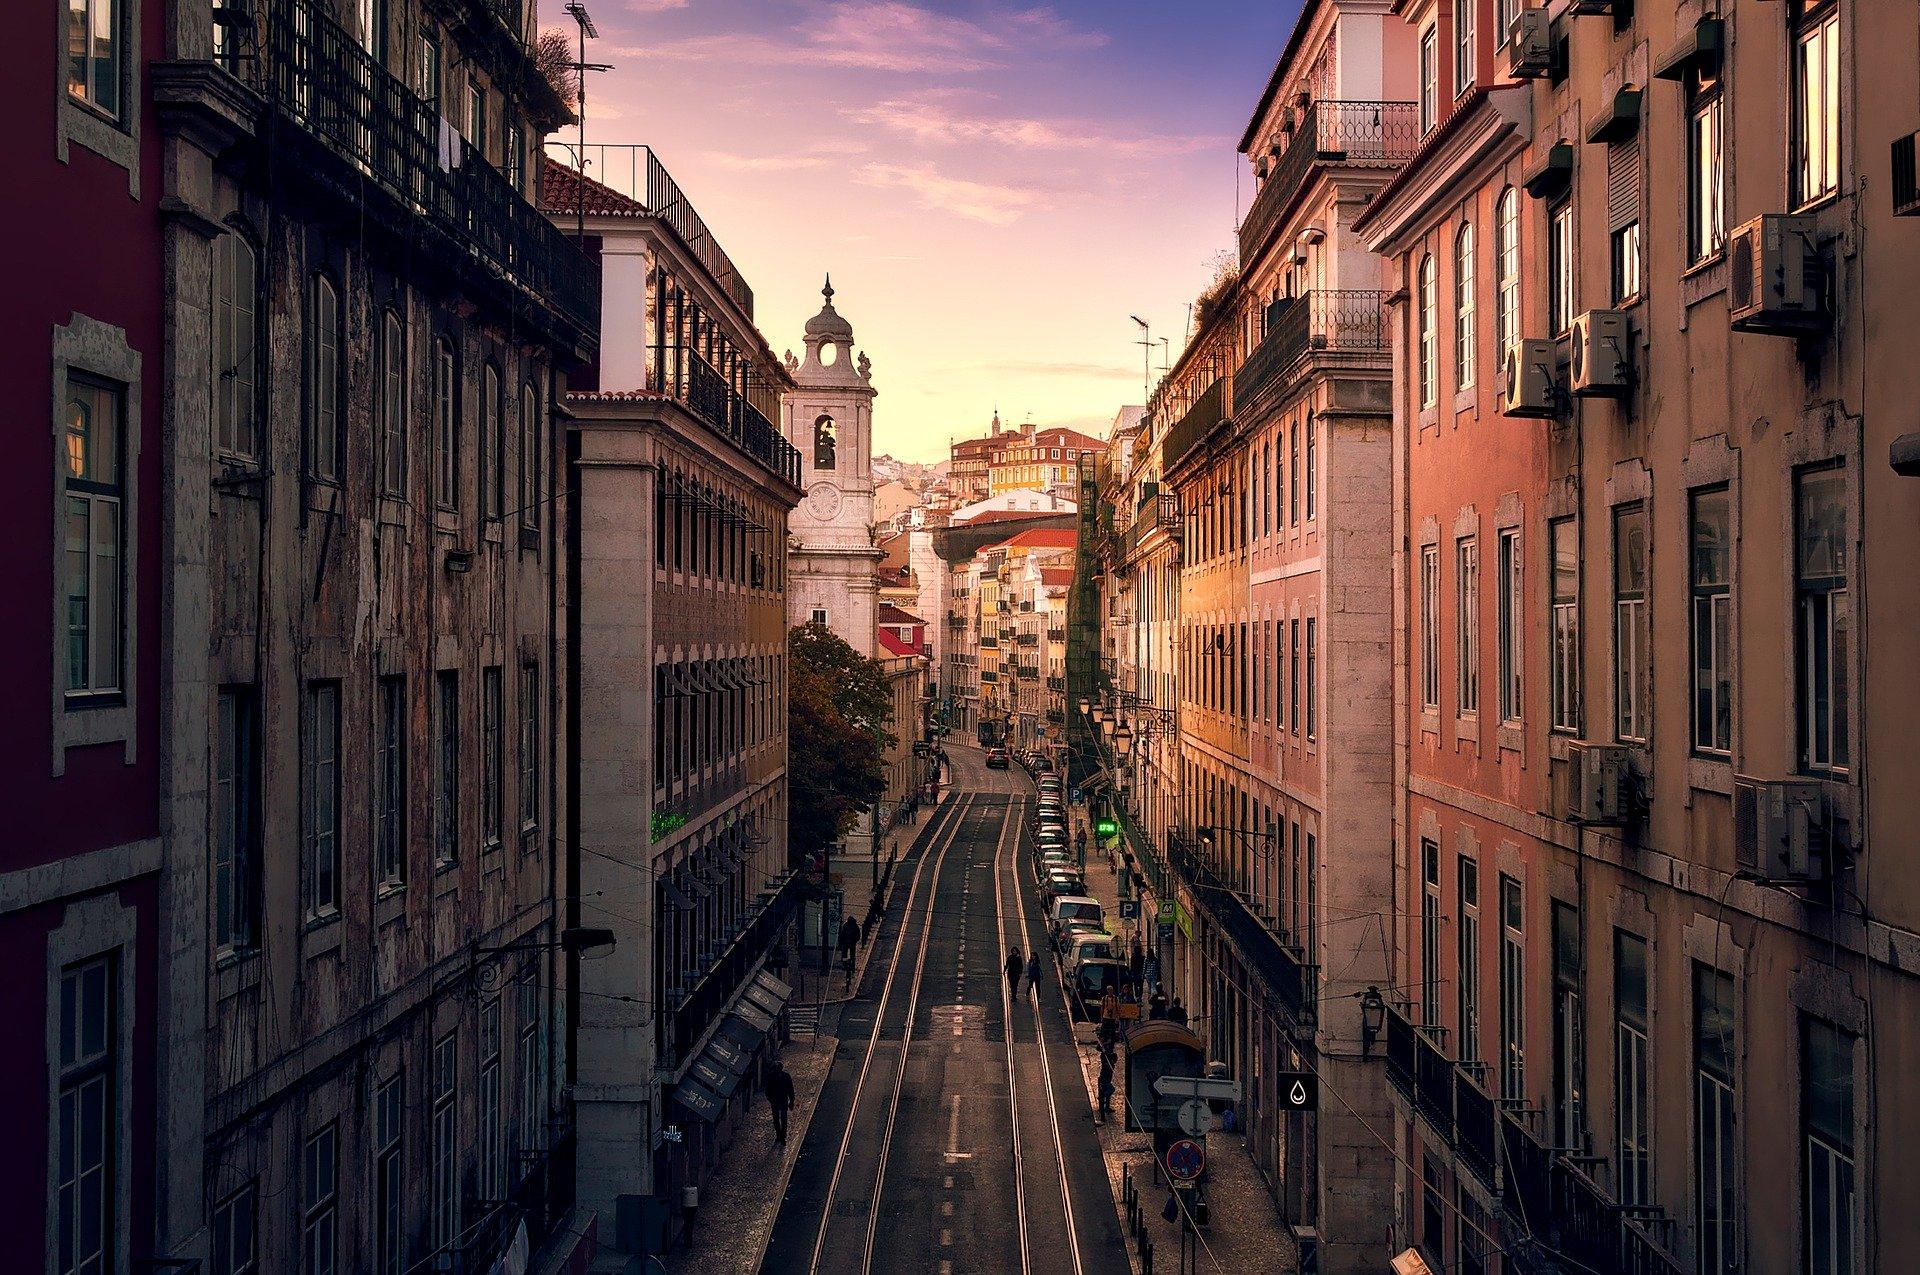 lisbon 1801727 1920 - Lissabon